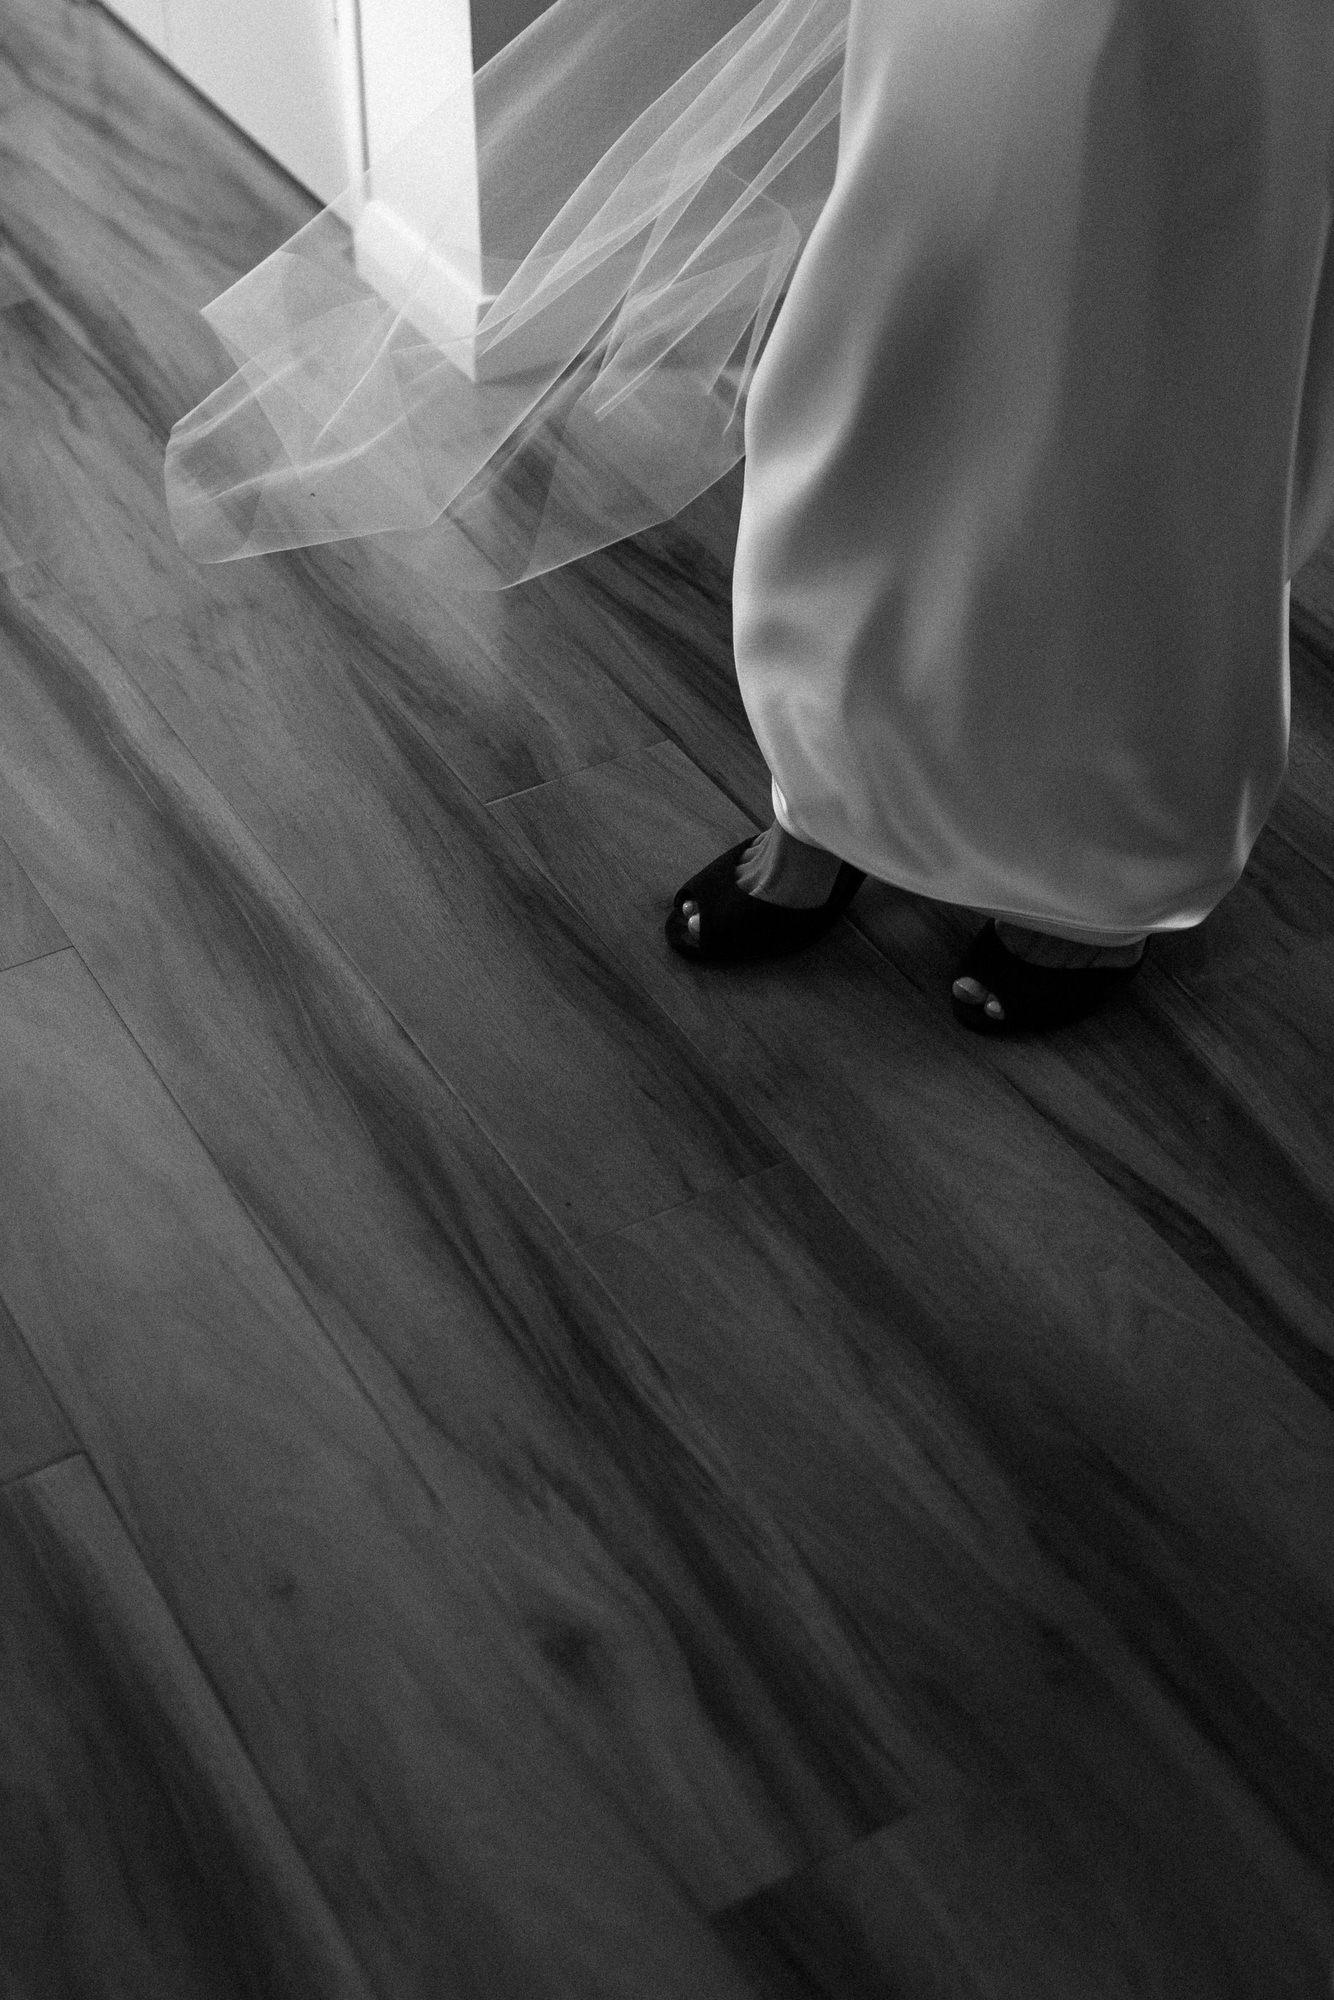 CLARK-WEDDING-EDITH-VALLEY-CARTER-ROSE-PHOTOGRAPHY-91.JPG